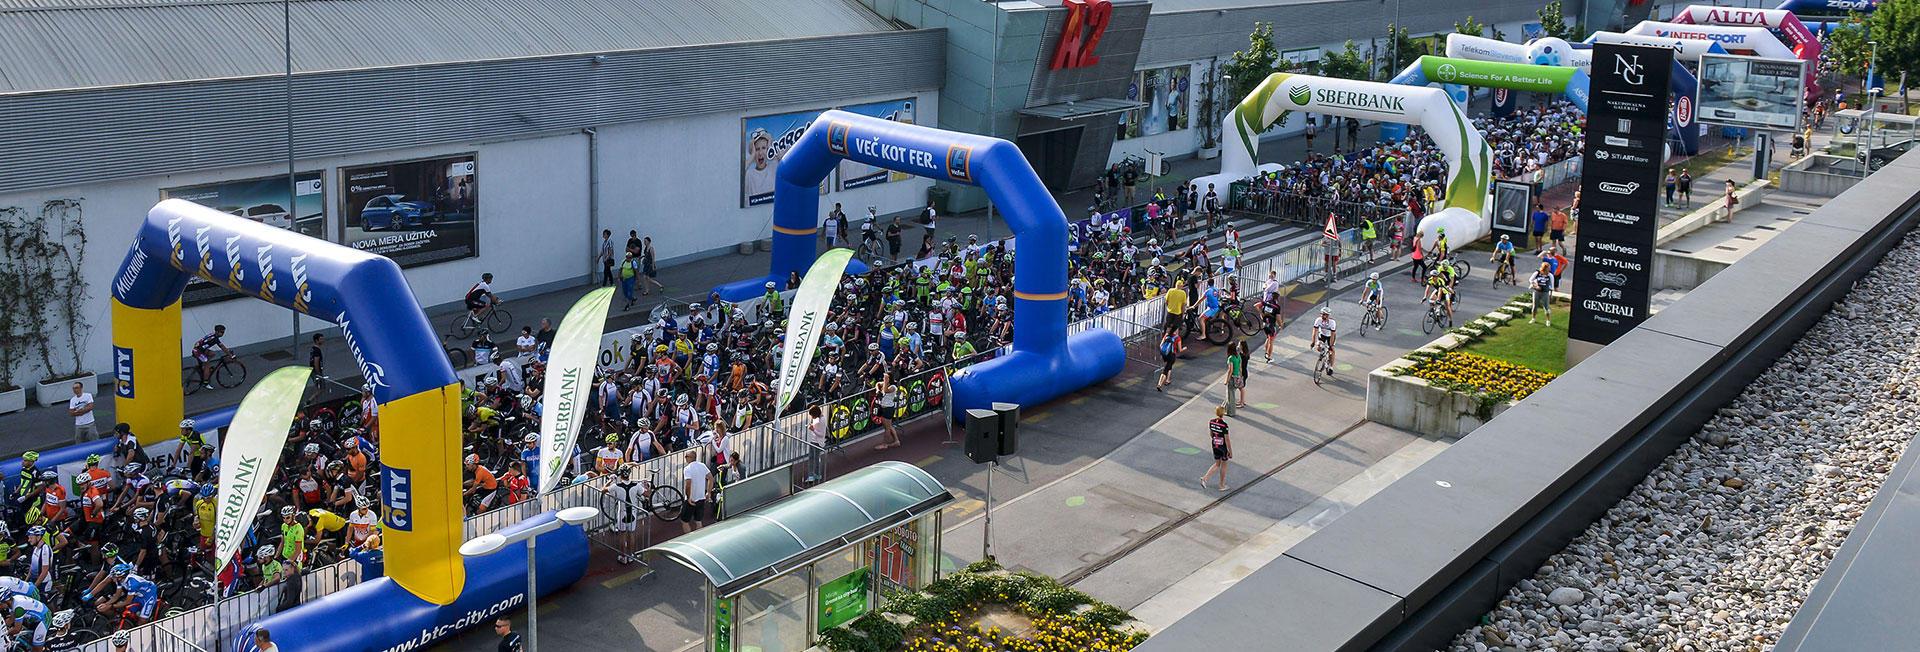 Maratona Franja BTC City 2016 10.-12. 6 2016